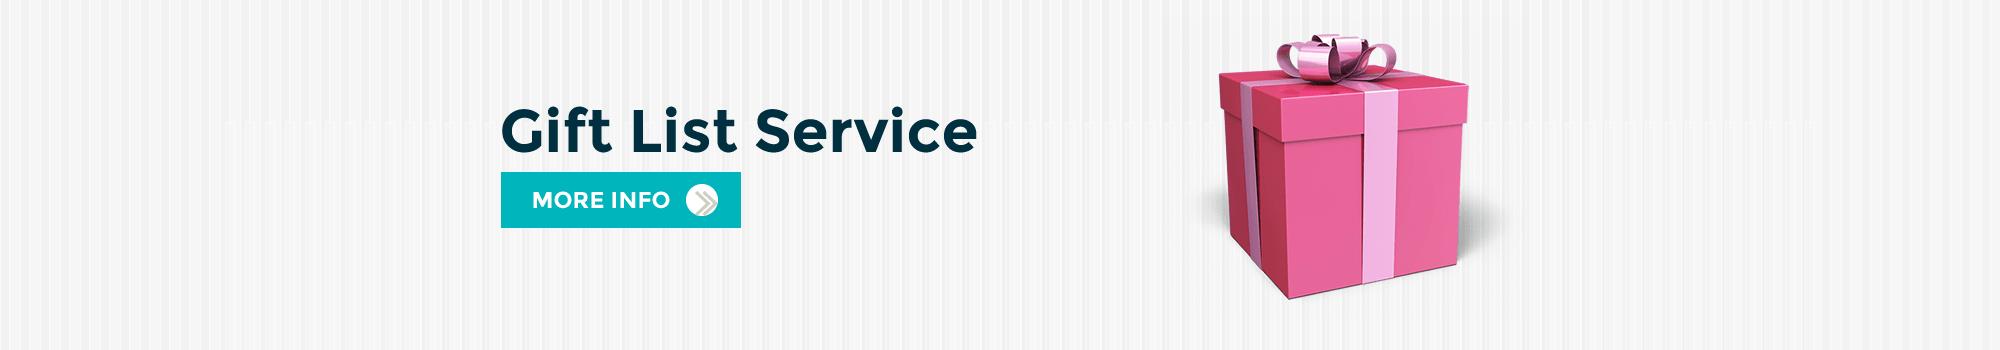 Gift List Service Banner